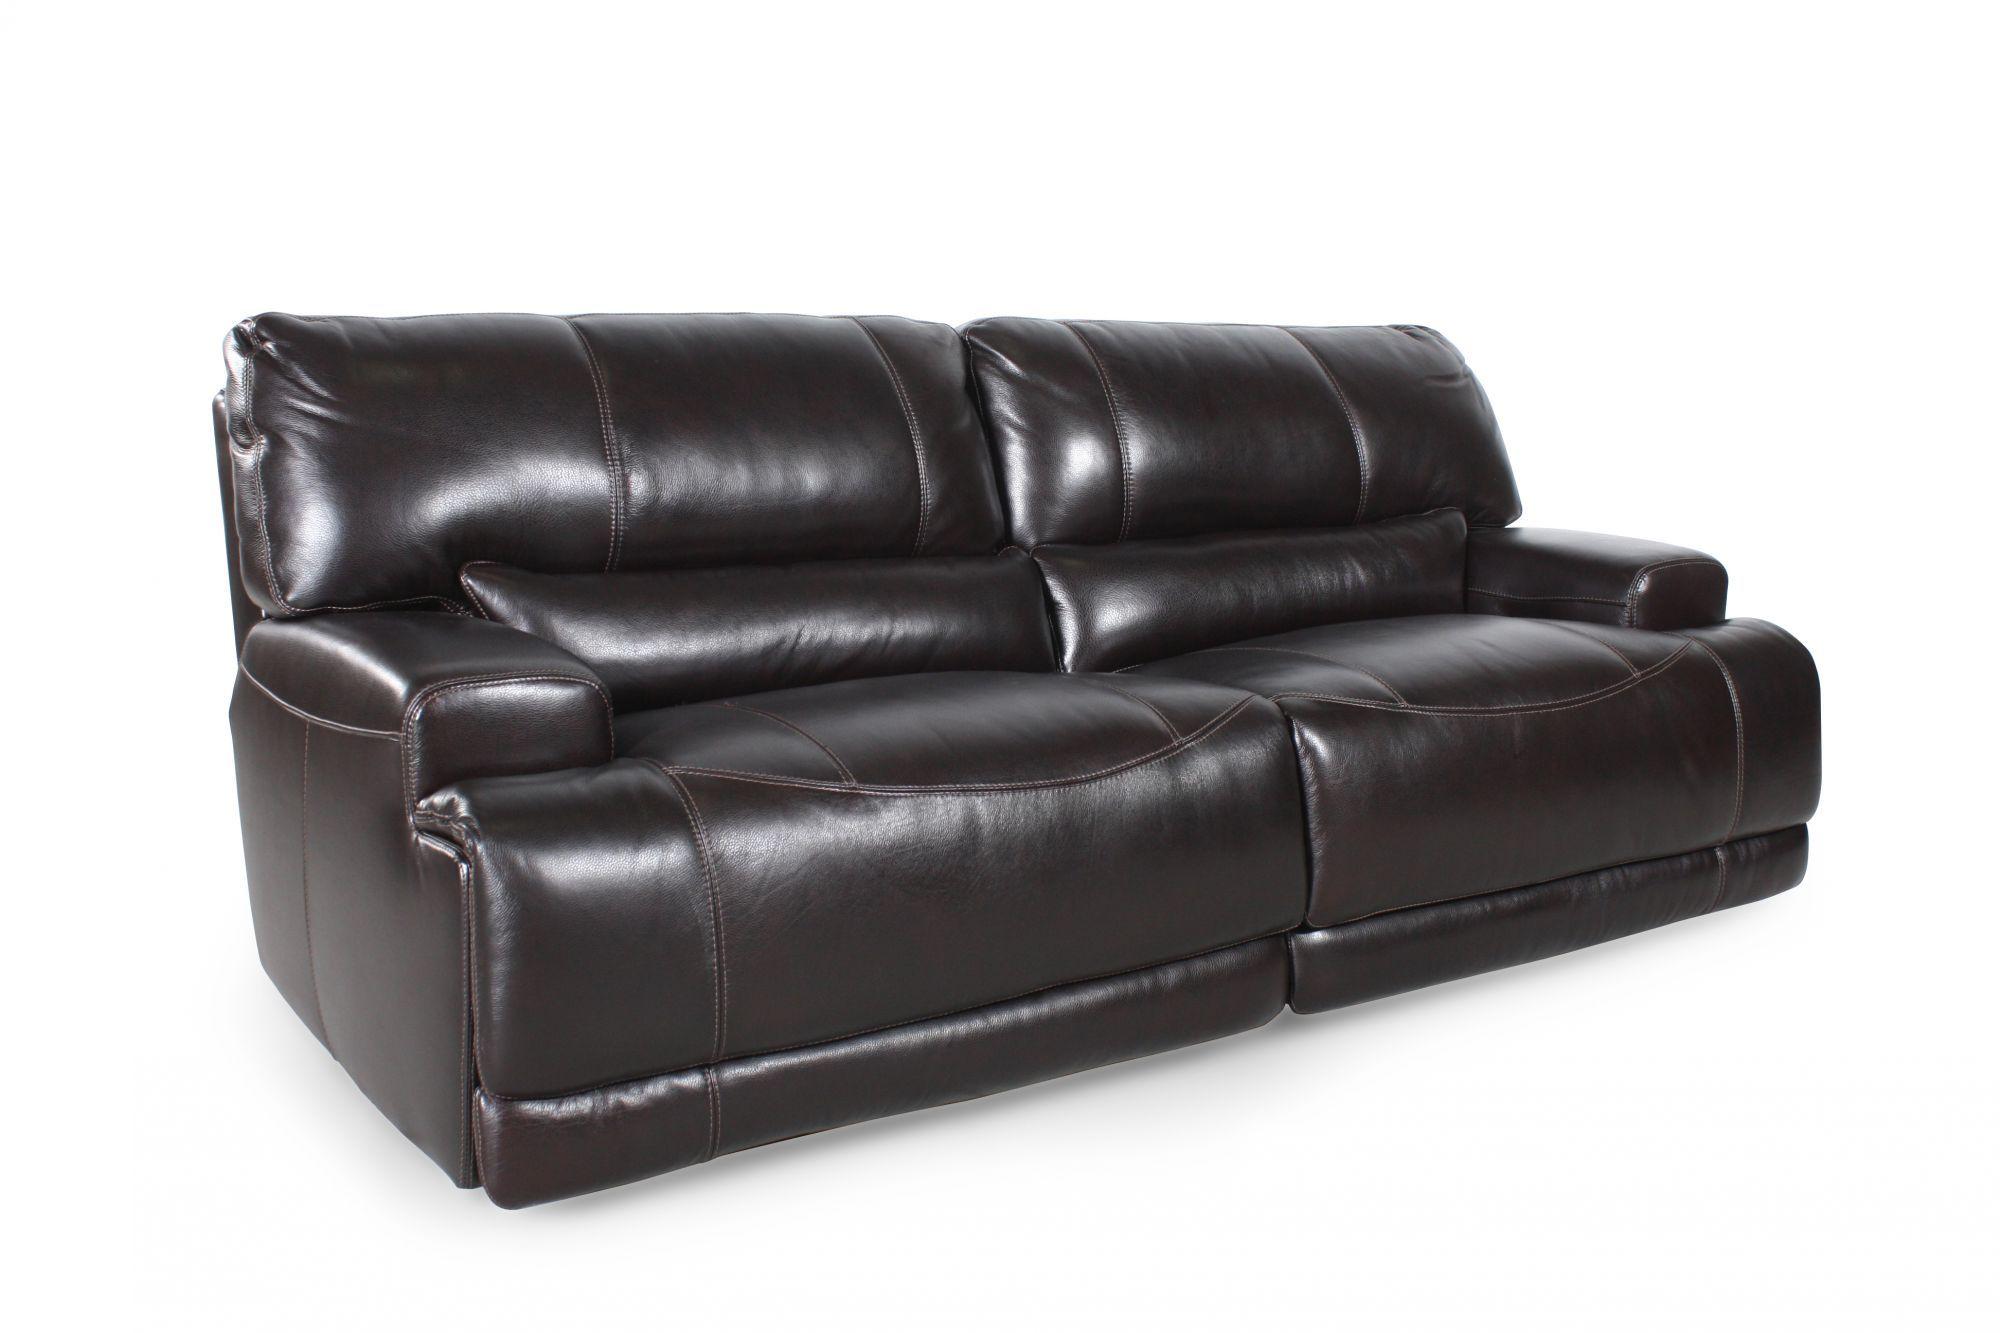 Simon Li Leather Longhorn Blackberry Sofa Sofa Leather